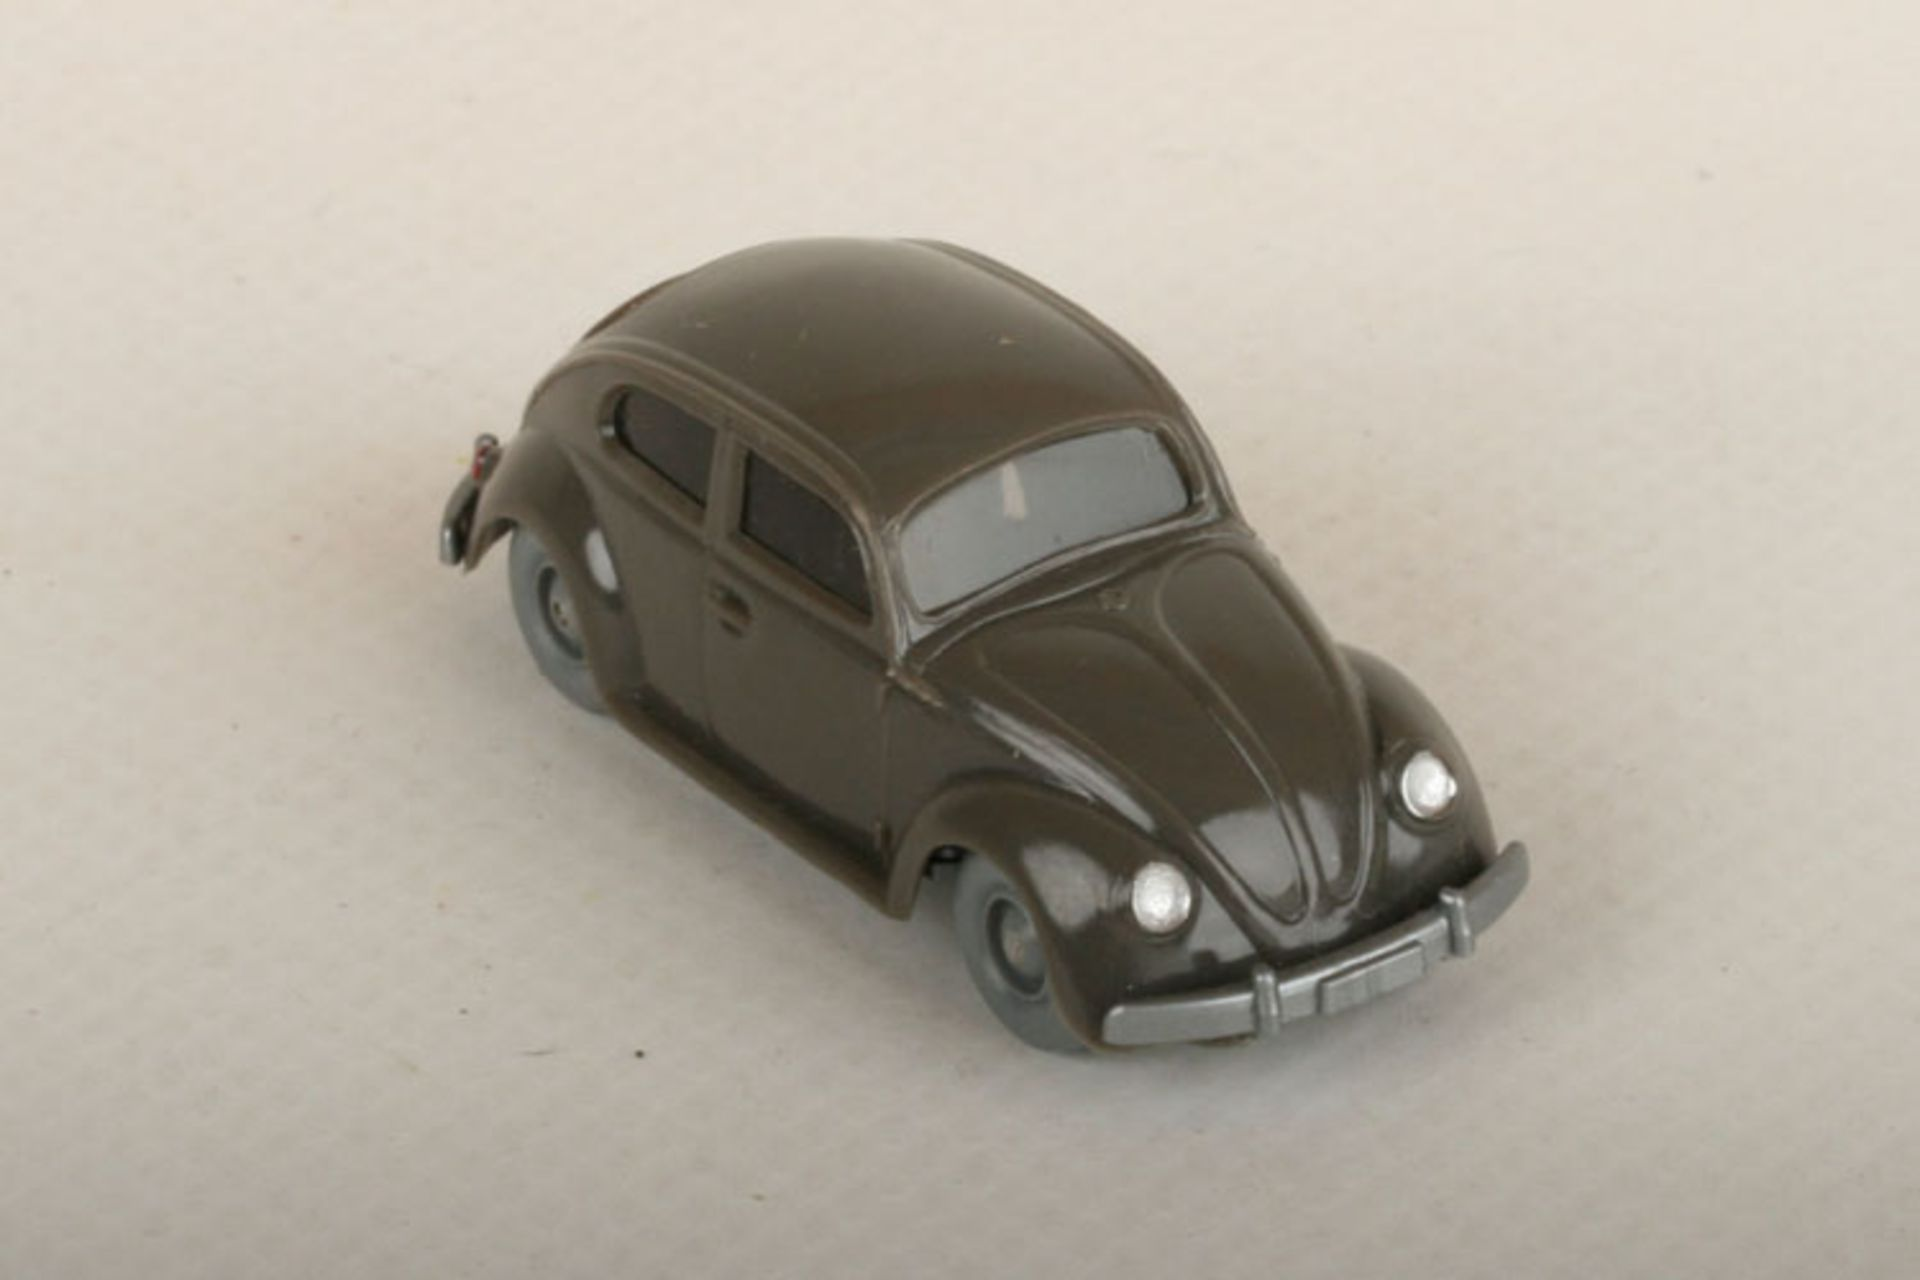 Los 1001 - Wiking VW Käfer Export umbragrau 30/7b, neuwertig